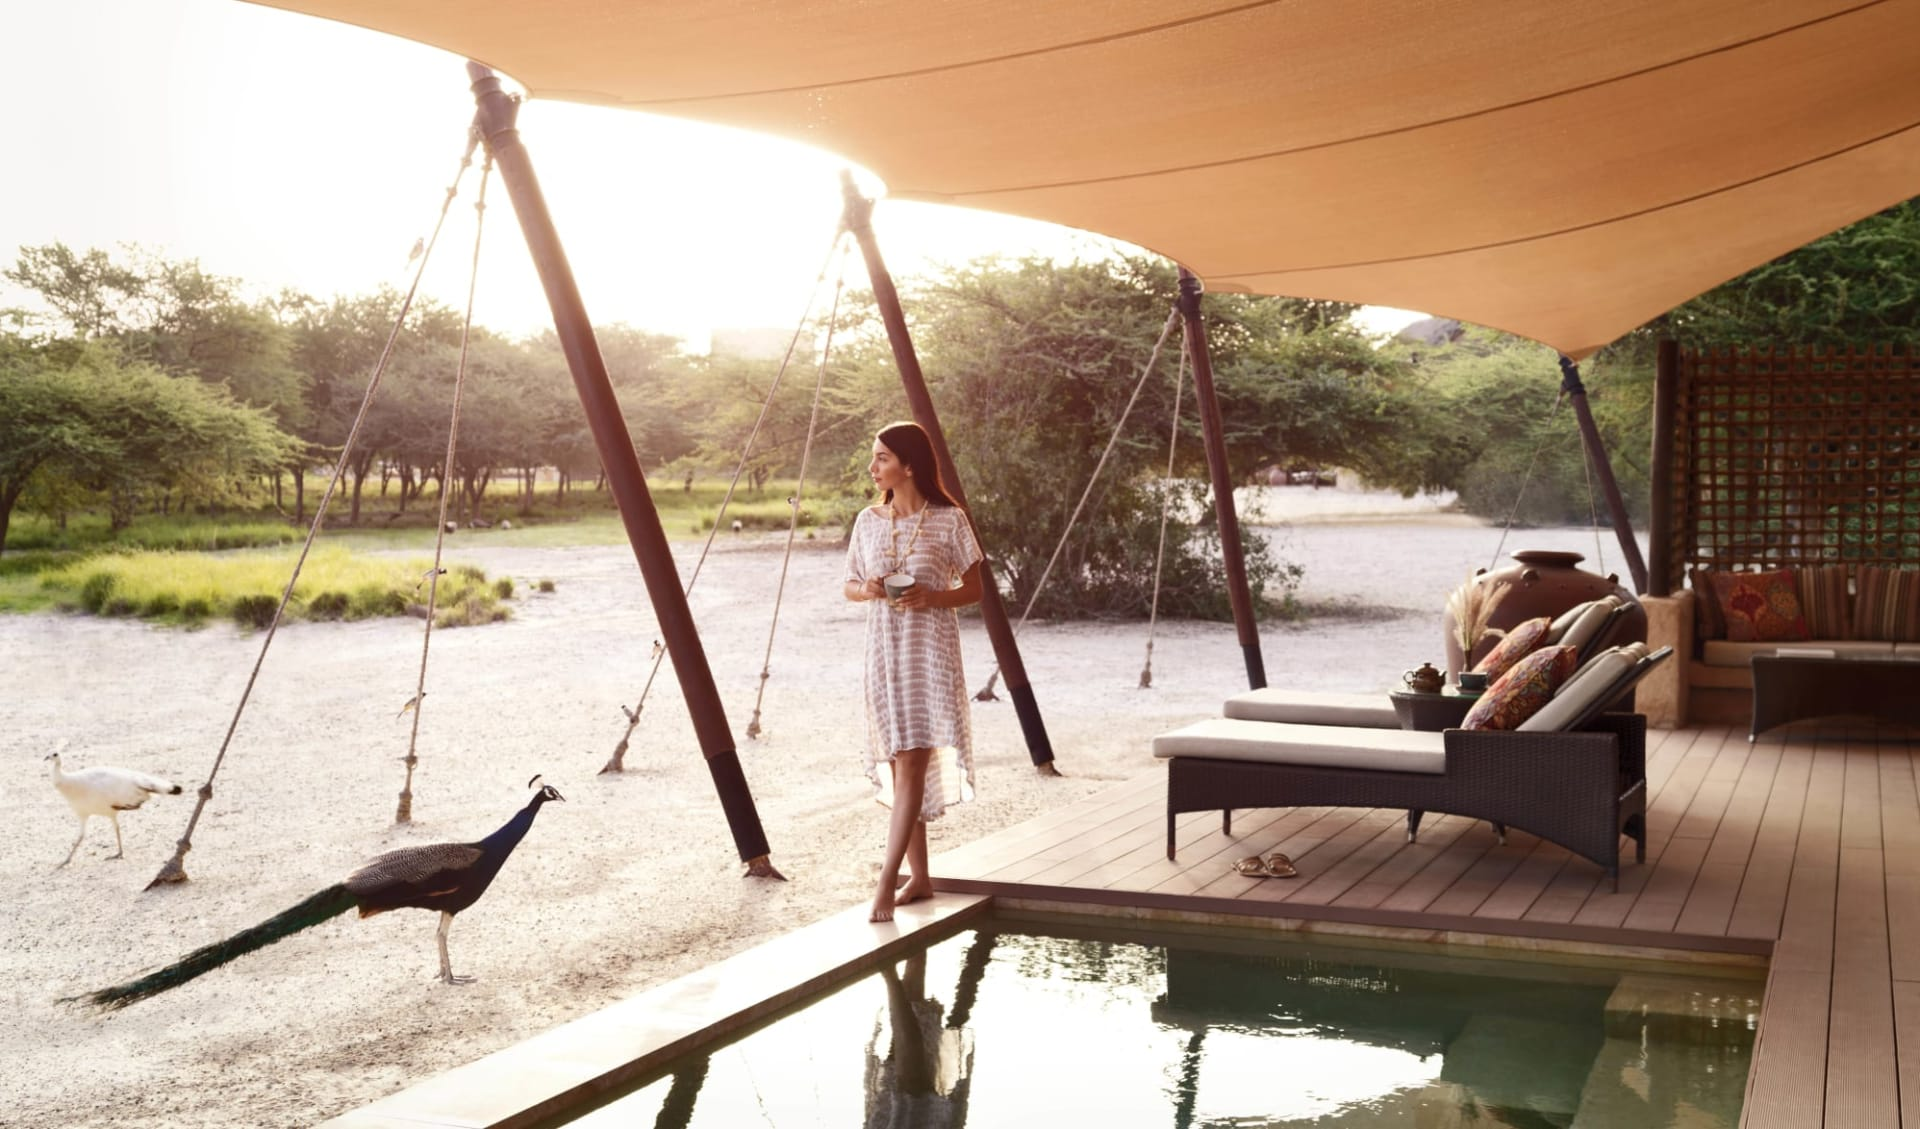 Anantara Al Sahel Villa Resort in Sir Bani Yas: One Bedroom Anantara Villa